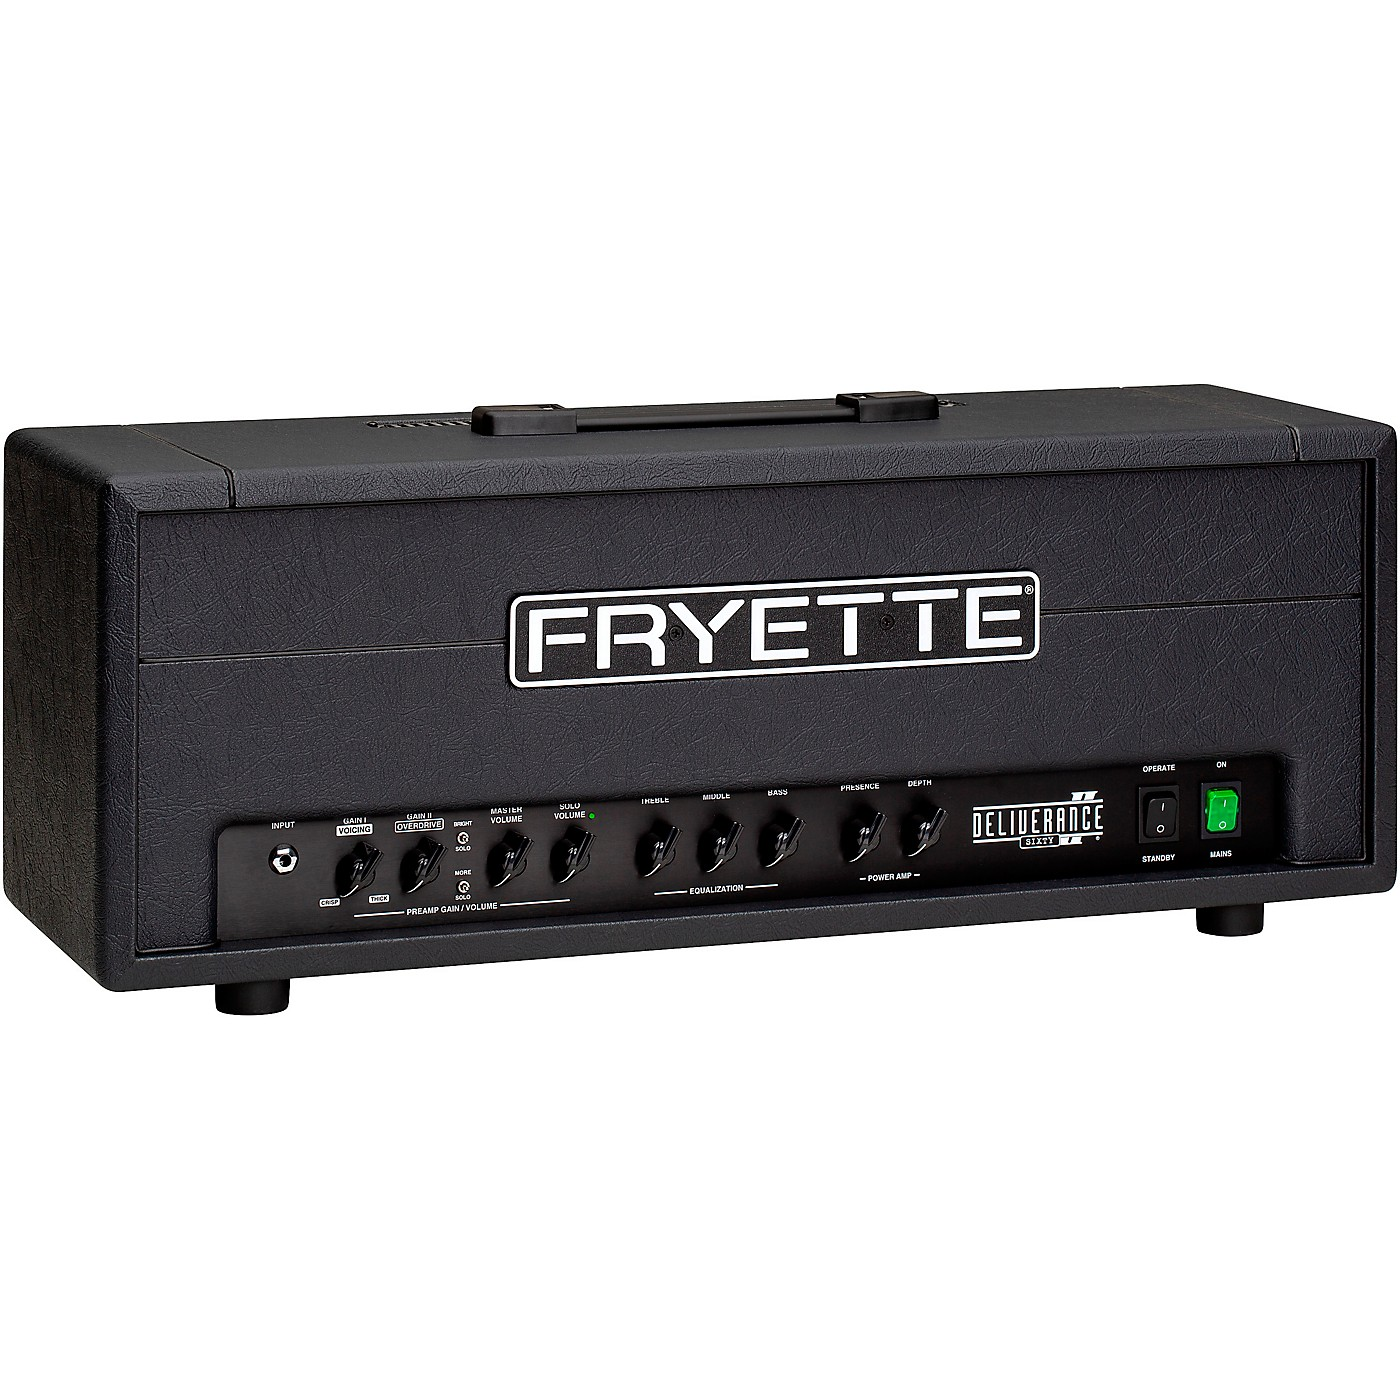 Fryette Deliverance Sixty D60 Series II 60W Tube Guitar Amp Head thumbnail